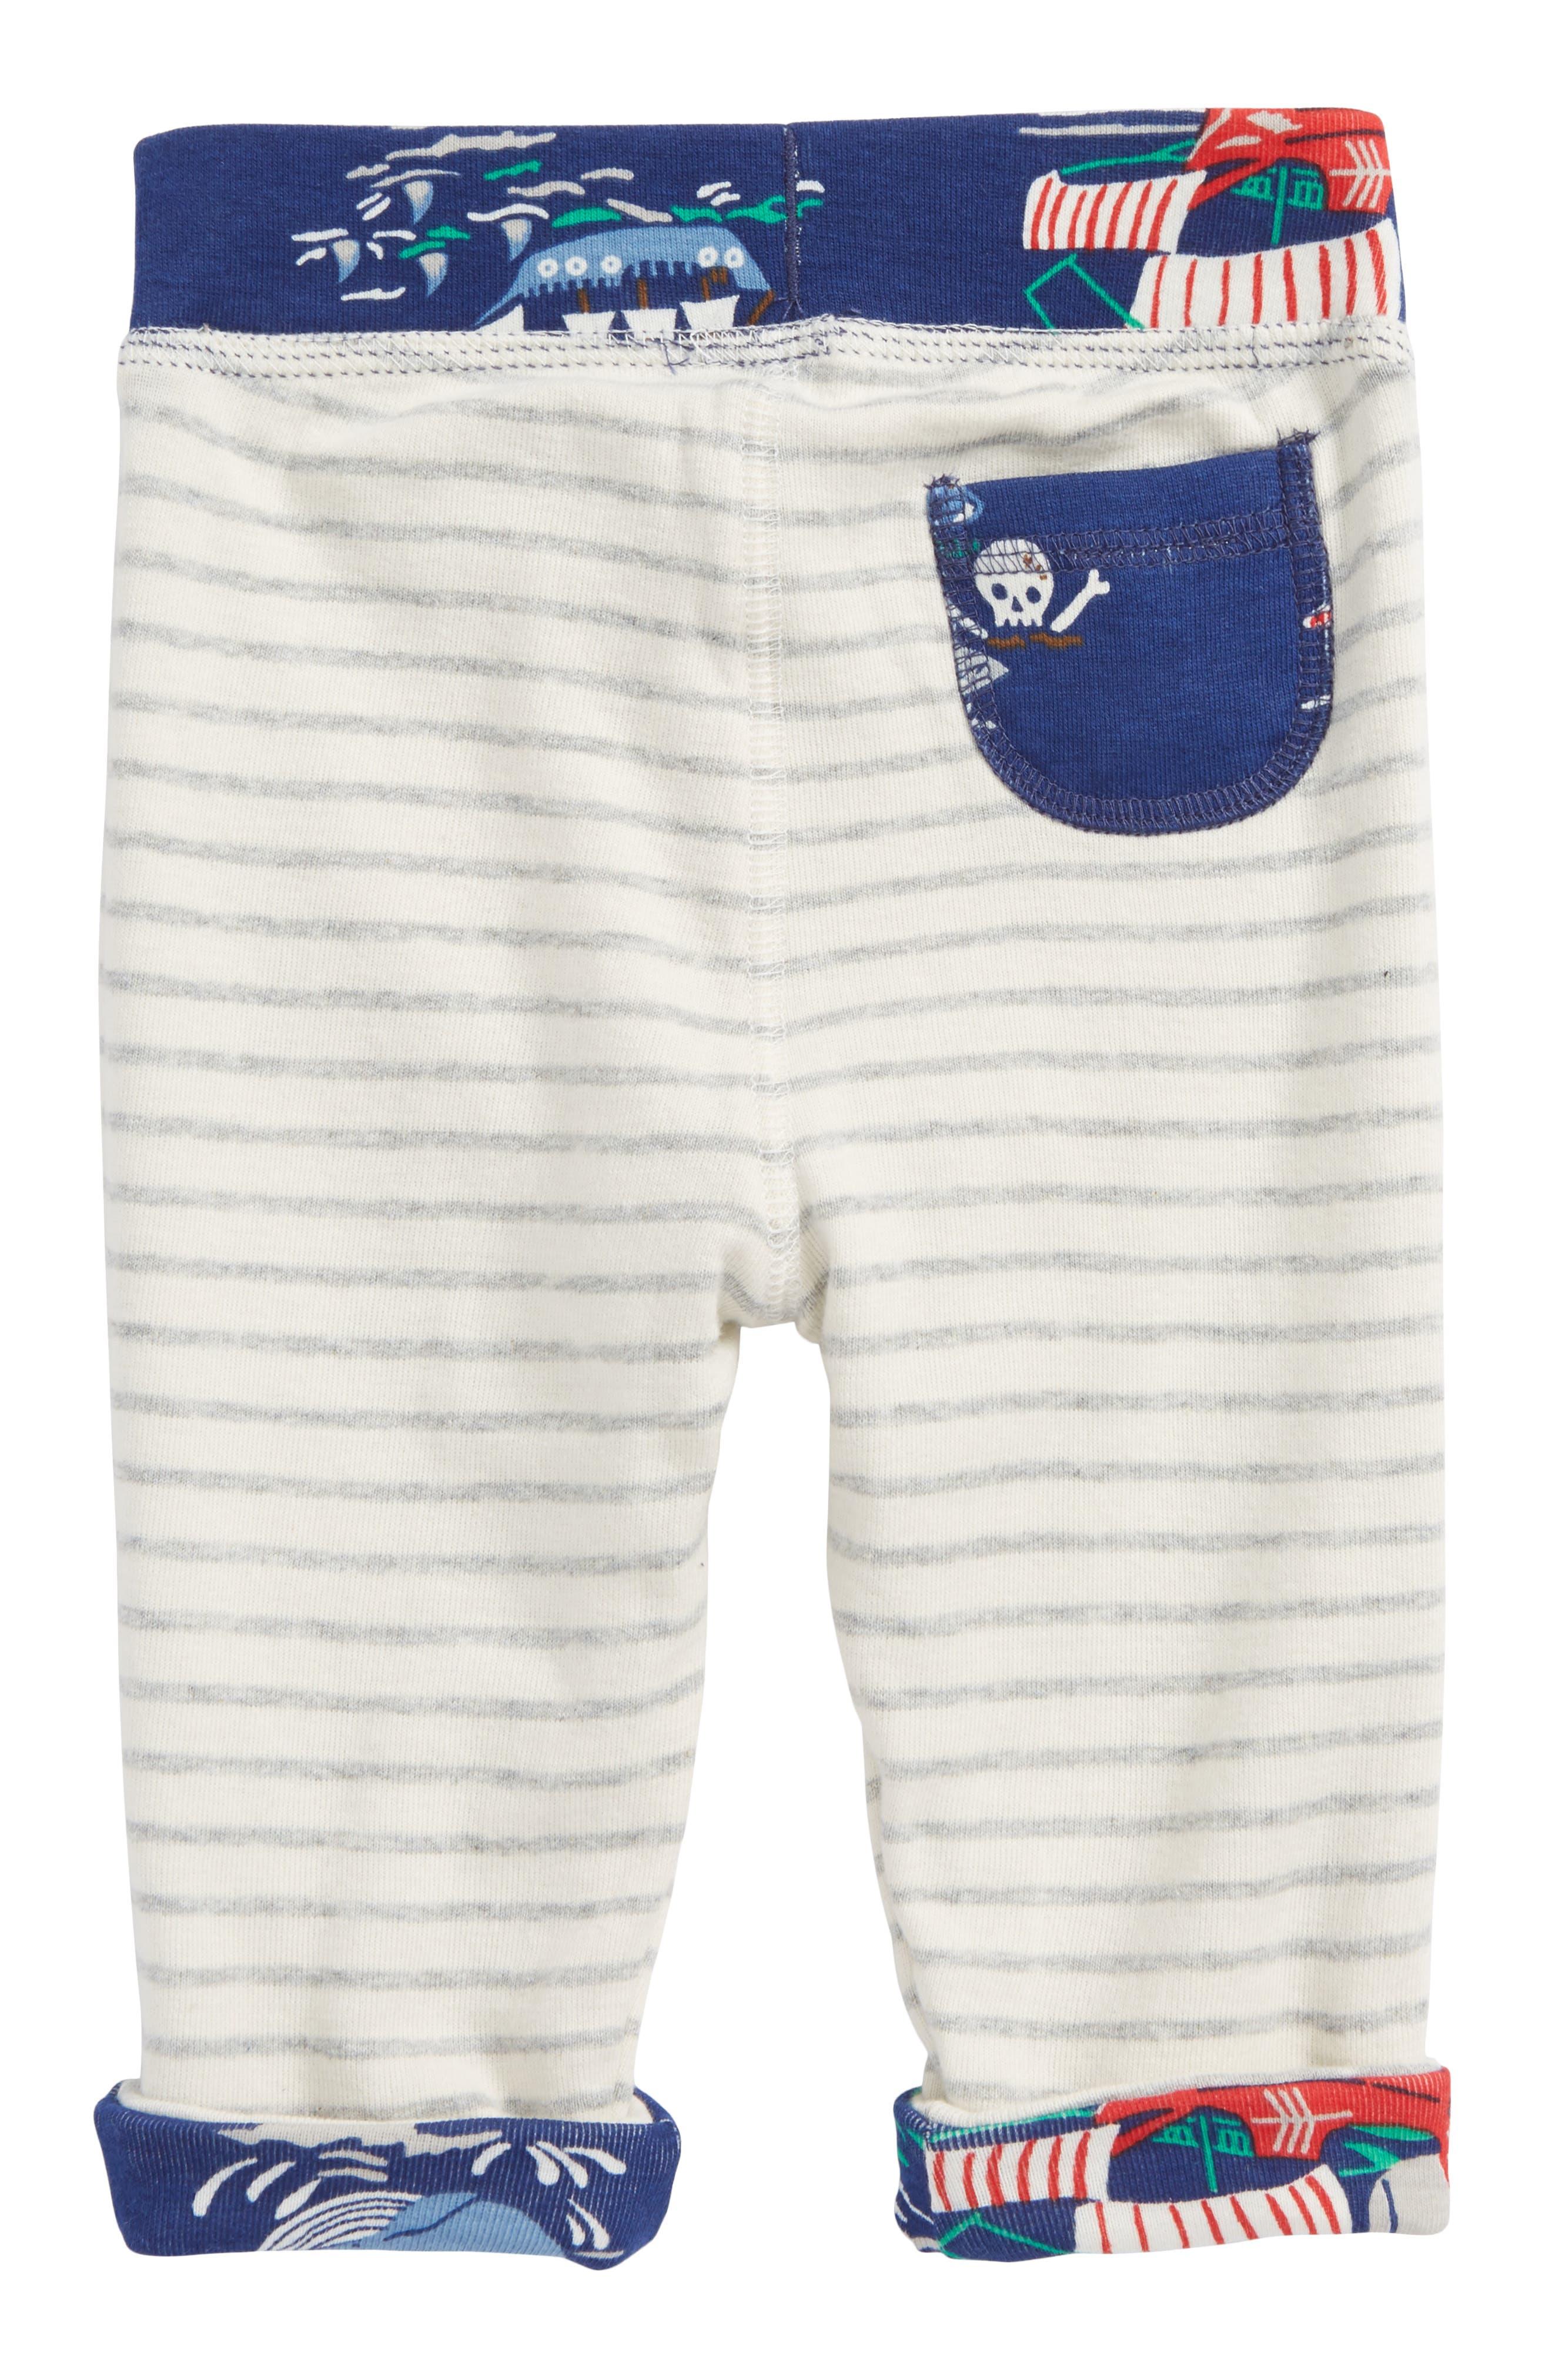 Reversible Knee Patch Pants,                             Alternate thumbnail 3, color,                             Beacon Blue/ Pirate Ship